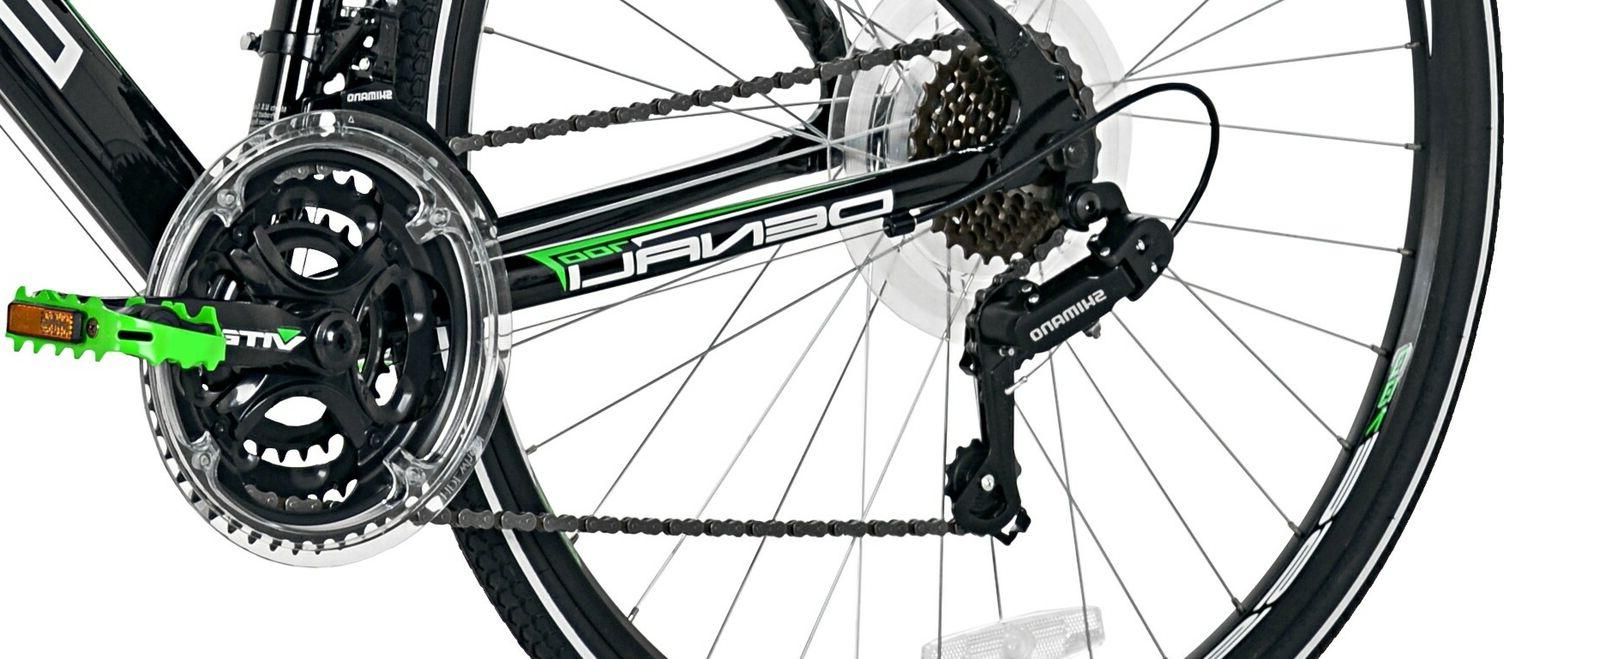 Denali Road Bike, Bicycle Black/Green **FREE 2 SHIPPING**